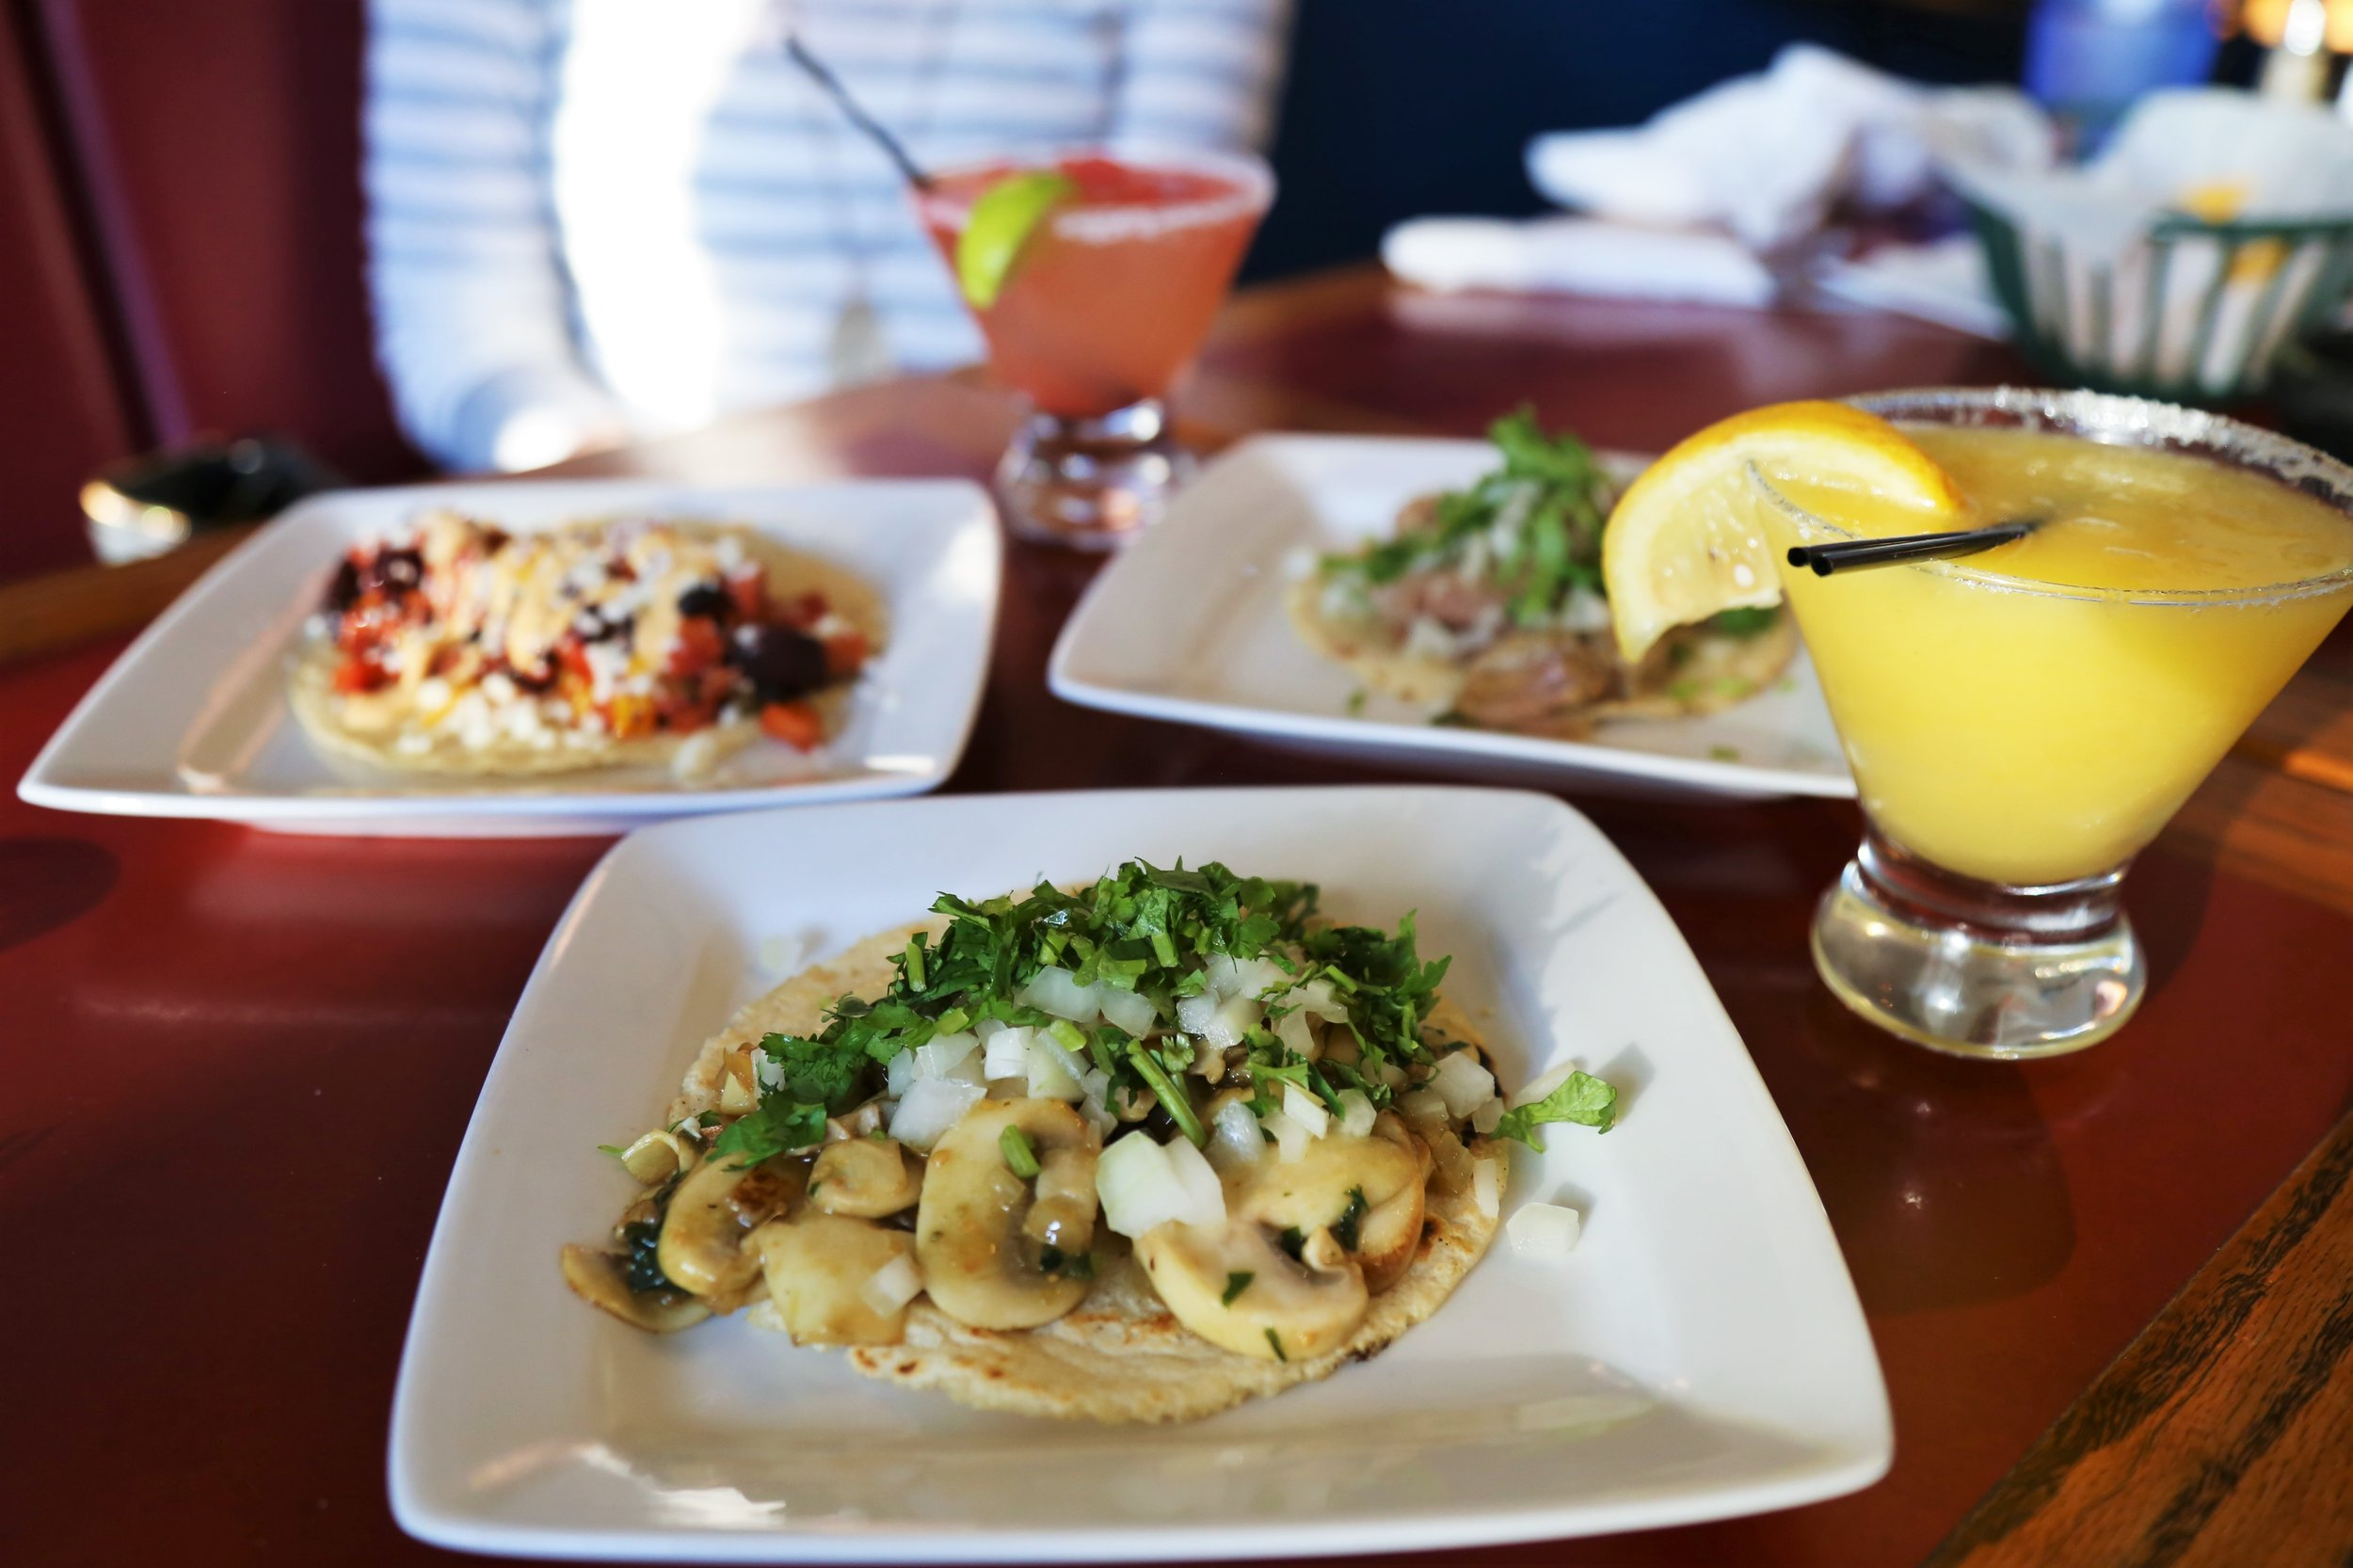 Luna Azul tacos and margaritas!